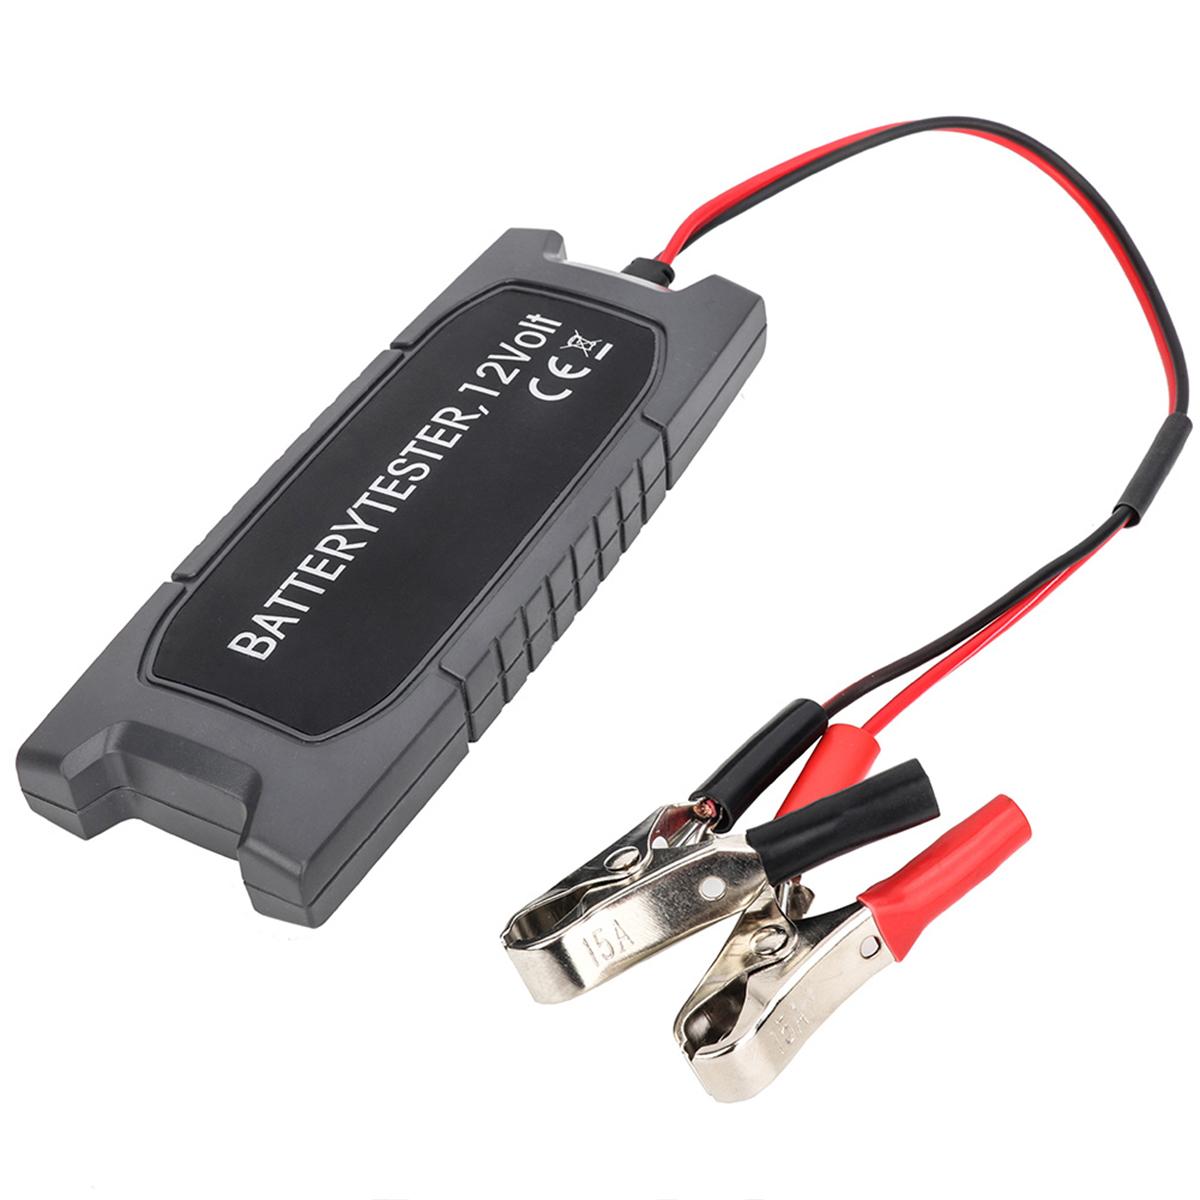 12V Батарея Тестер с 6 LED Диагностическим выводом анализатора проверки генератора Инструмент - фото 3